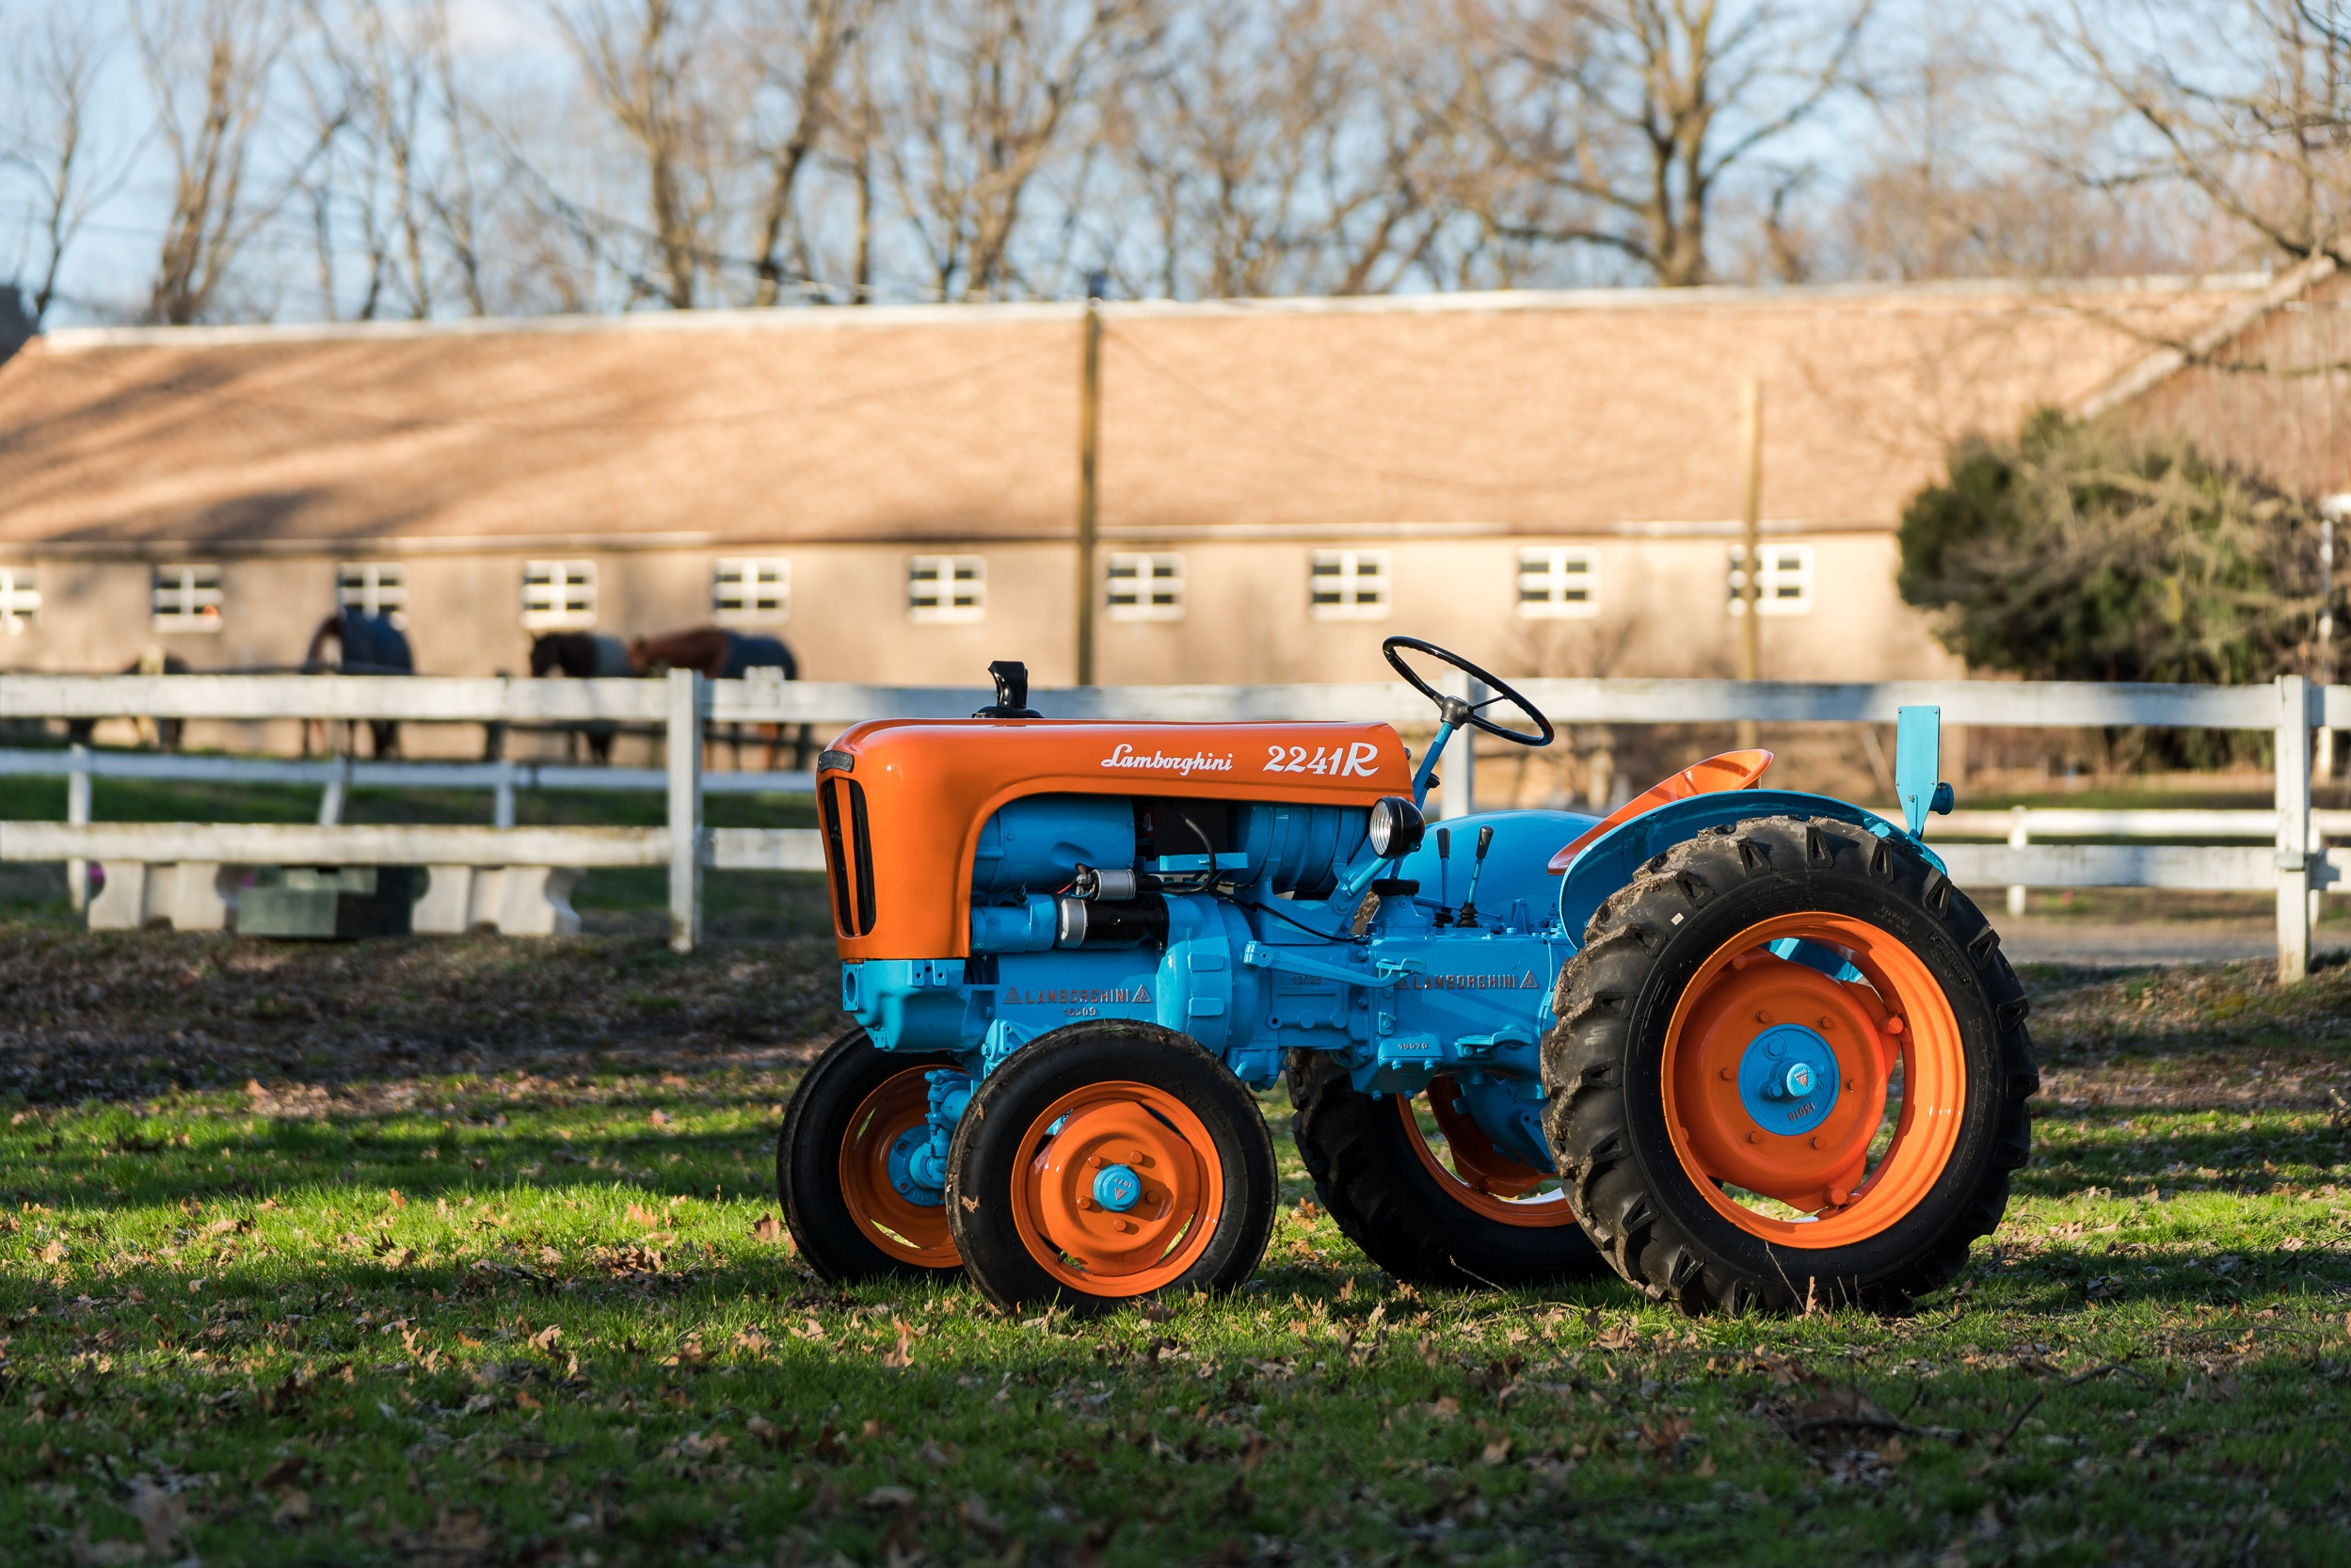 lamborghini_tractor-1.jpg